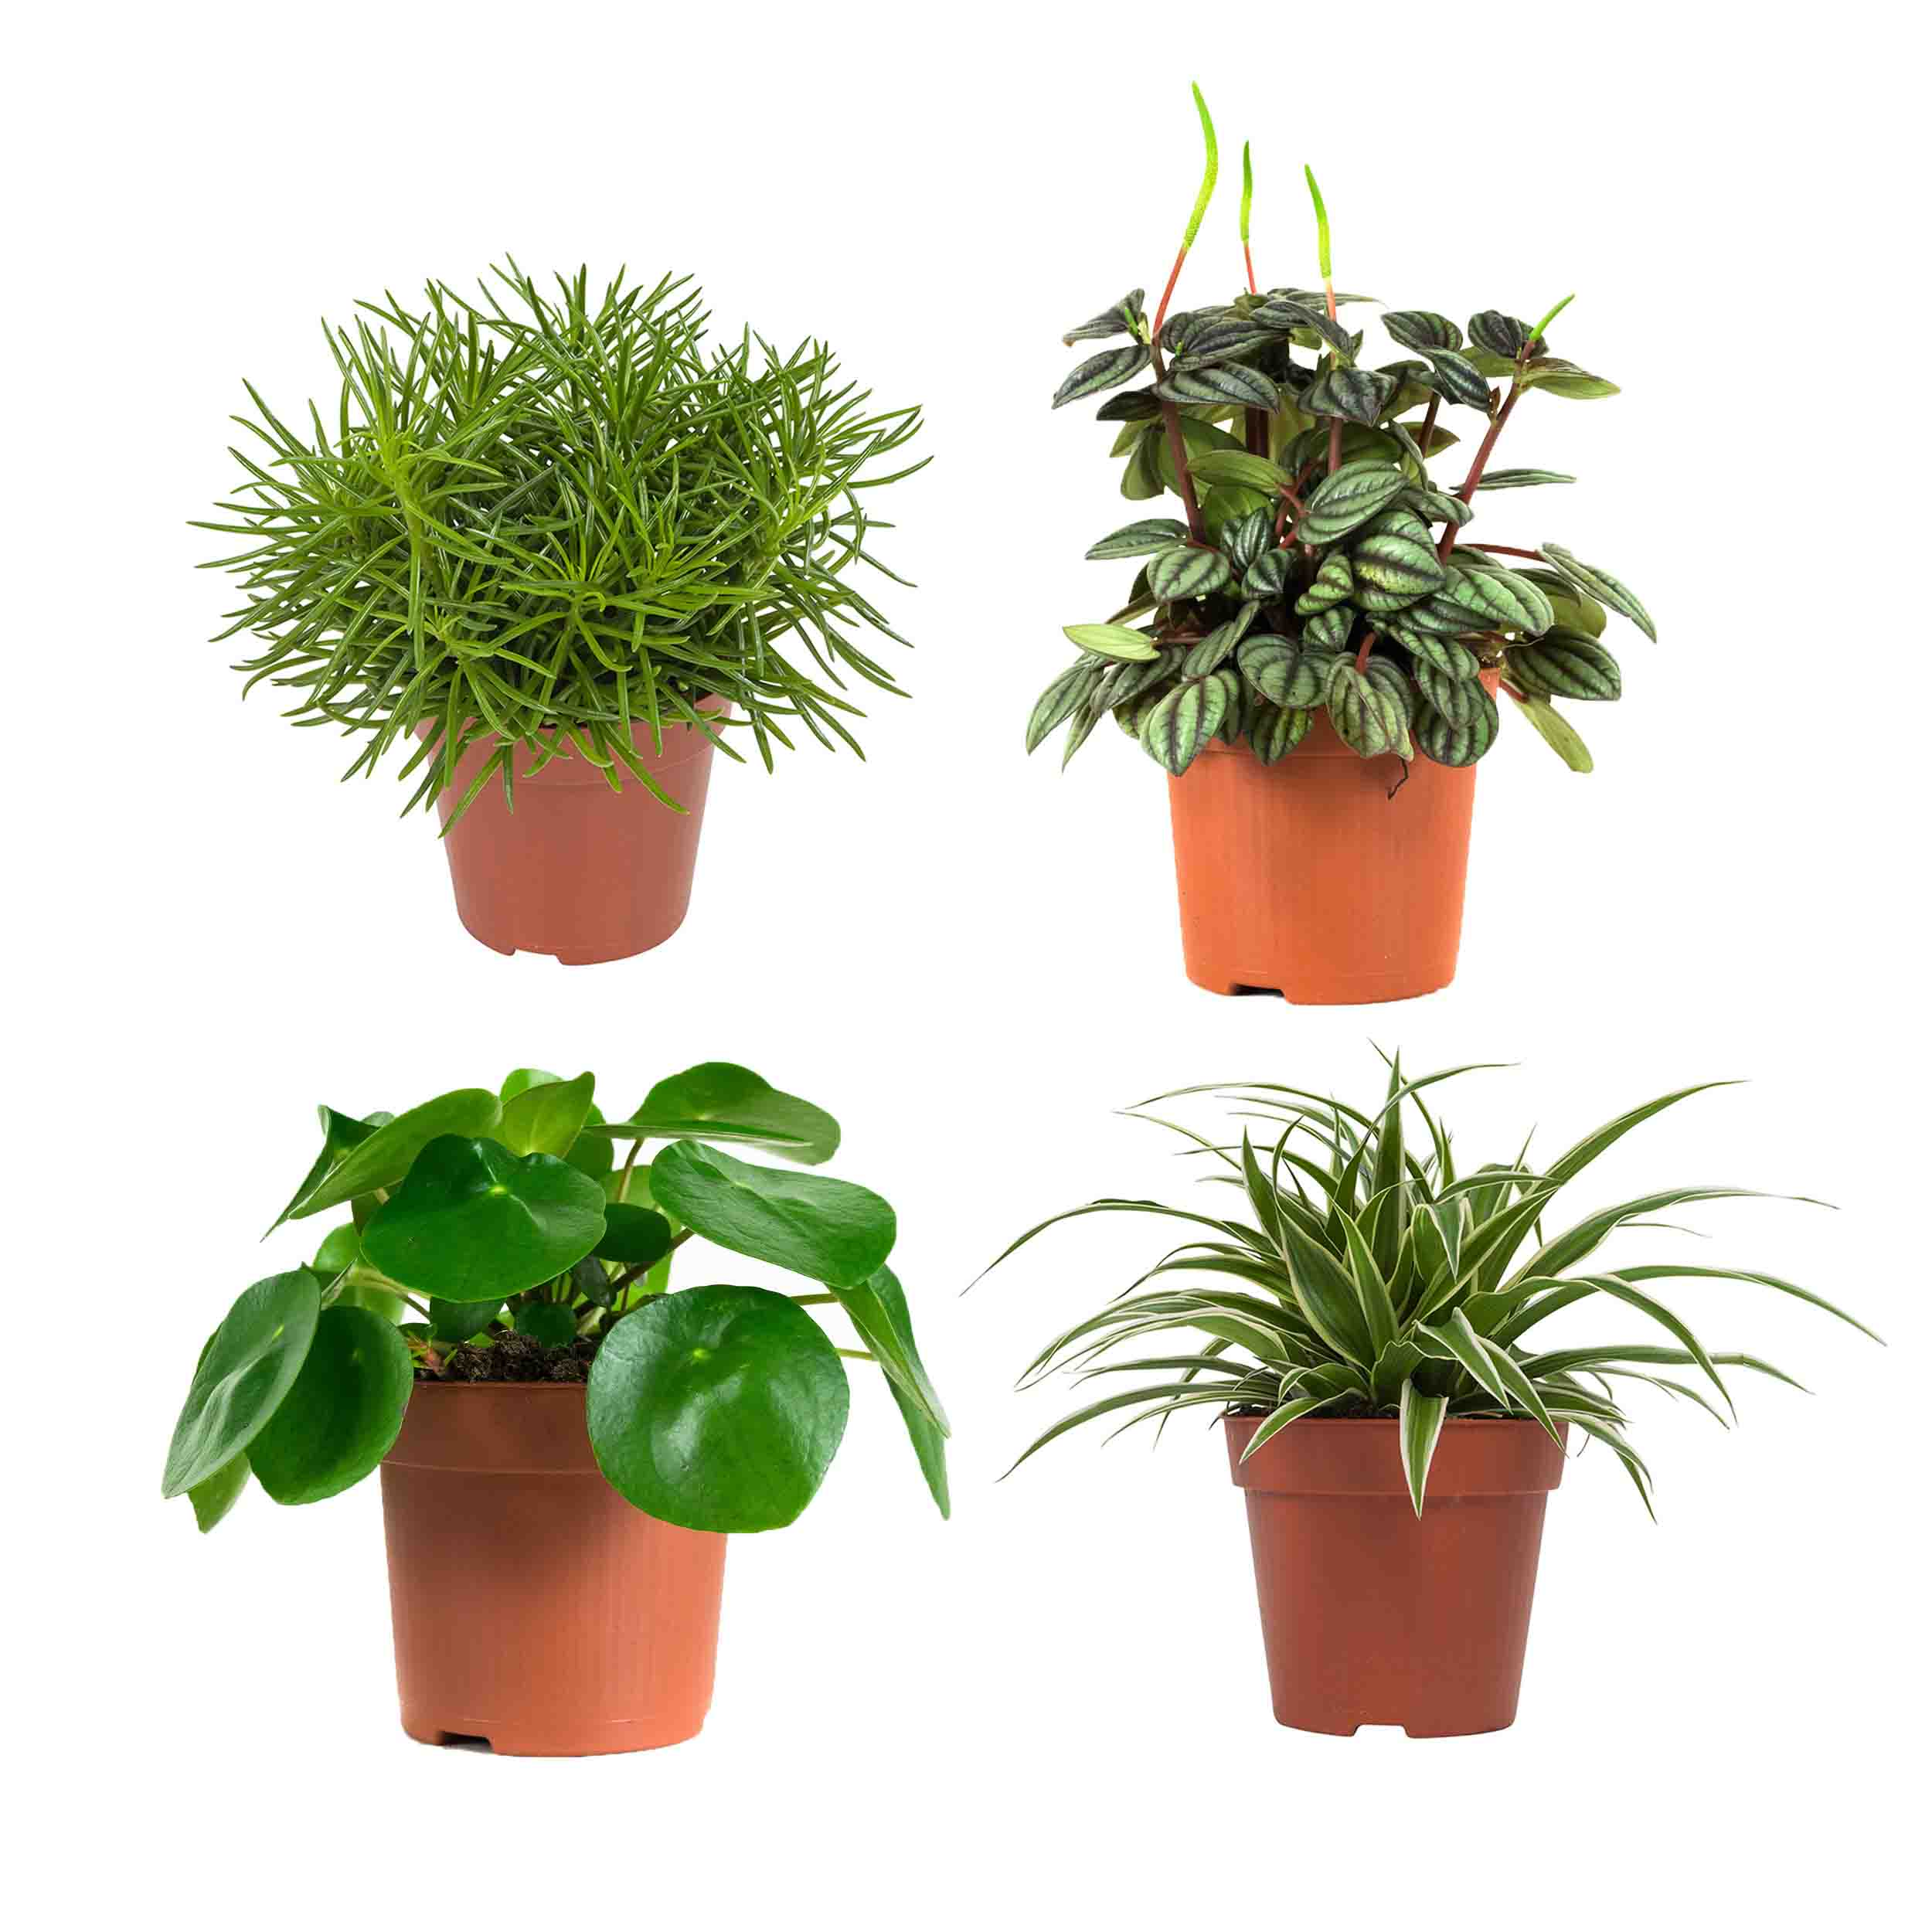 Plant 20 cm: Peperomia, Chlorofyrum,Pannenkoekplant, Senecio (4 stuks)